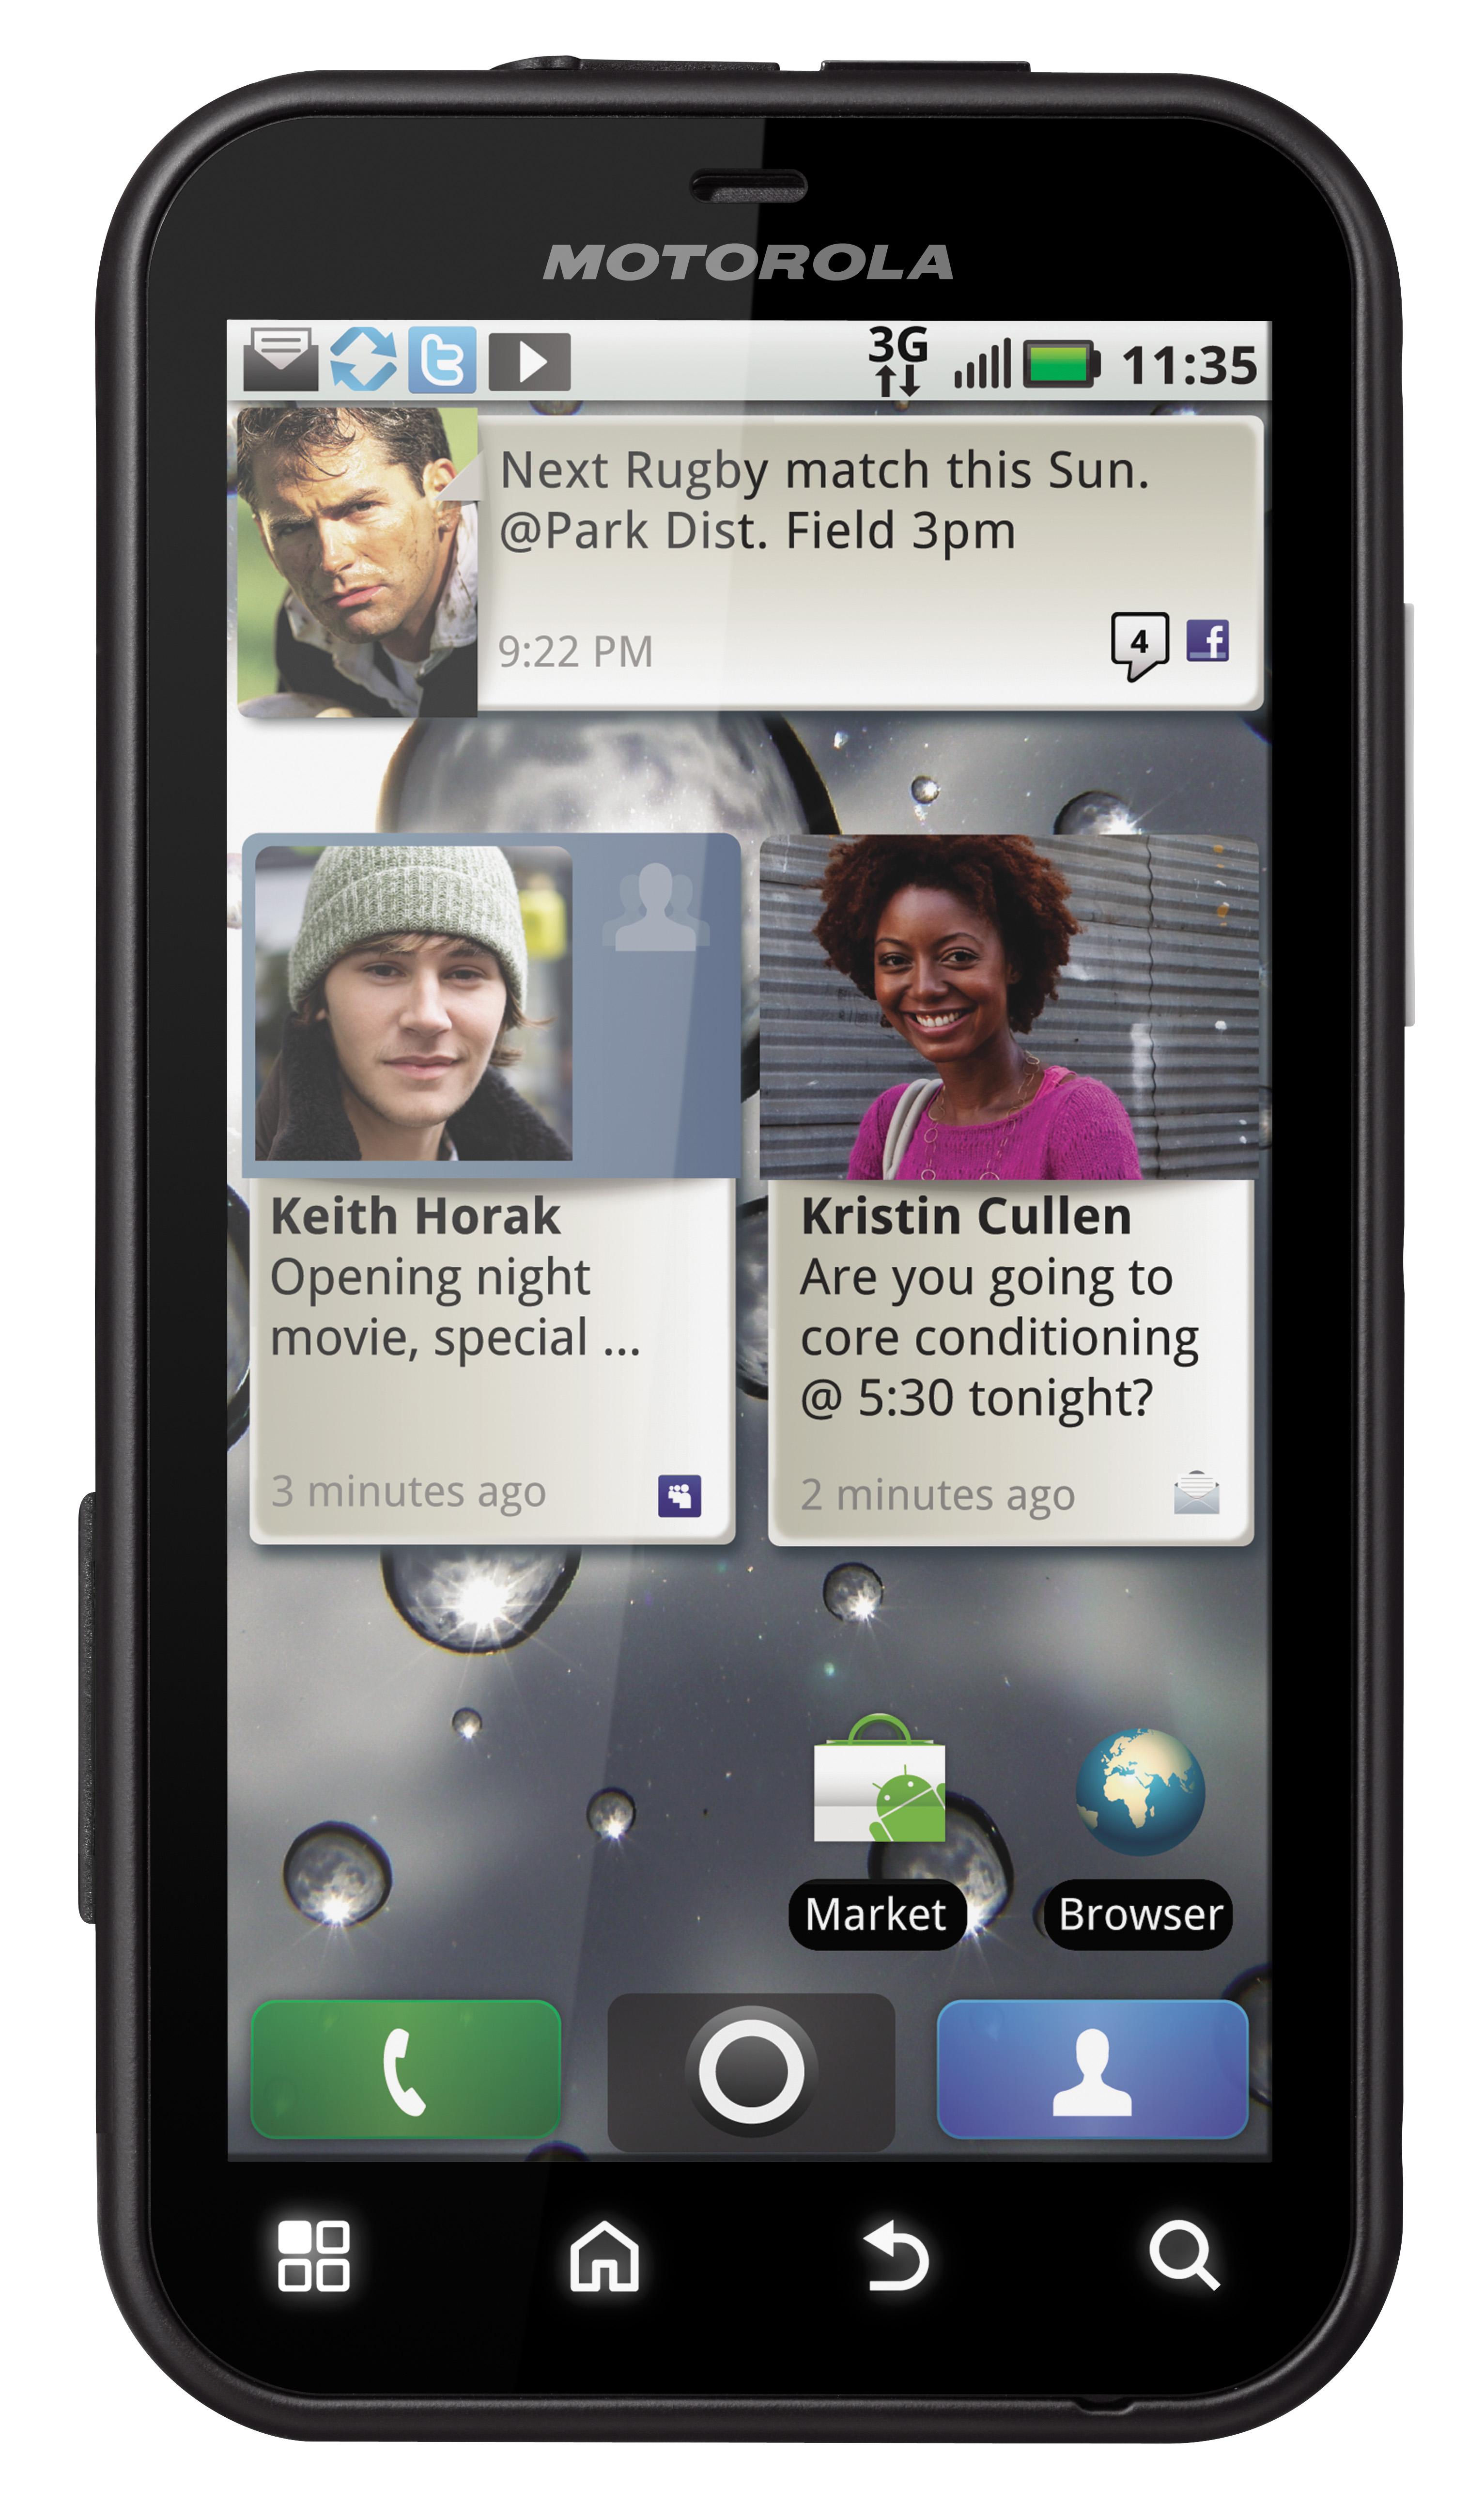 Camera Real Hidden Cameras phones t mobile android images guru motorola defy mobile